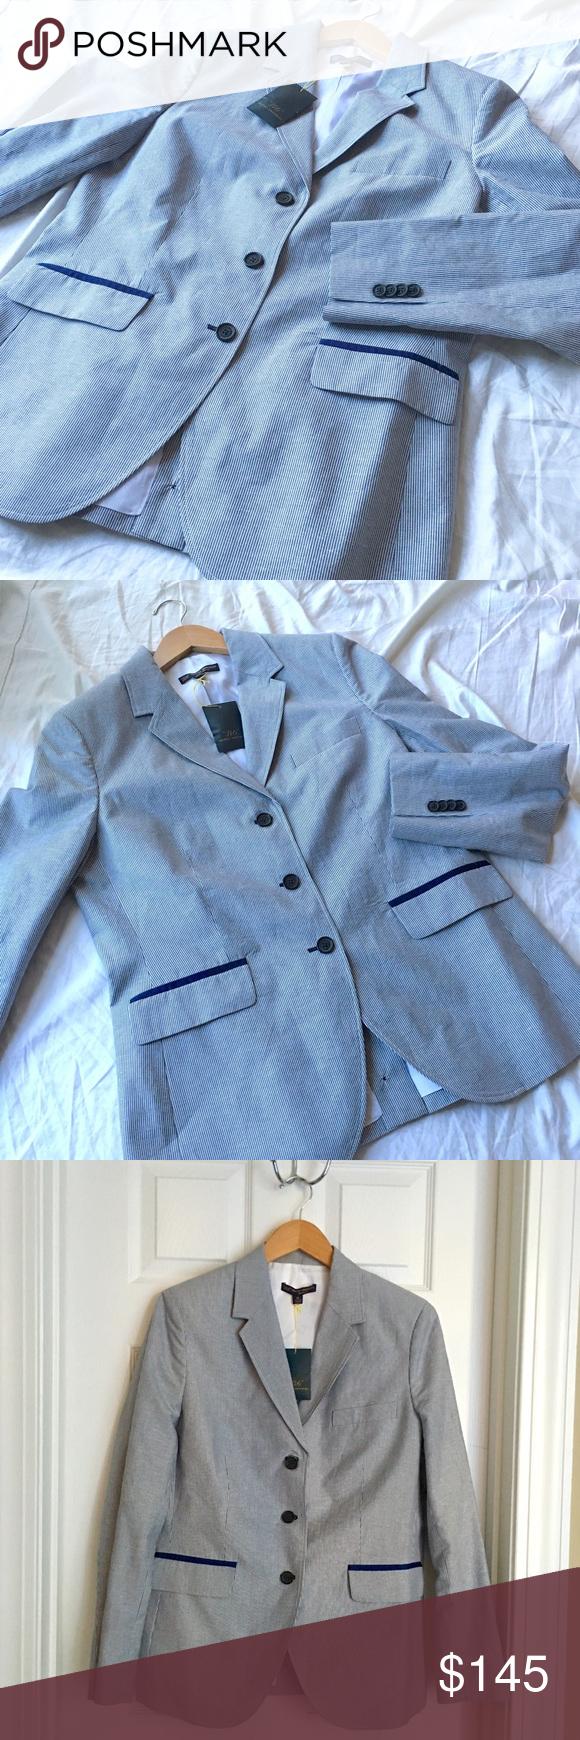 "Selling this Brooks Brothers ""346"" Pinstripe Milano Fit Blazer on Poshmark! My username is: carrieburke. #shopmycloset #poshmark #fashion #shopping #style #forsale #Brooks Brothers #Jackets & Blazers"